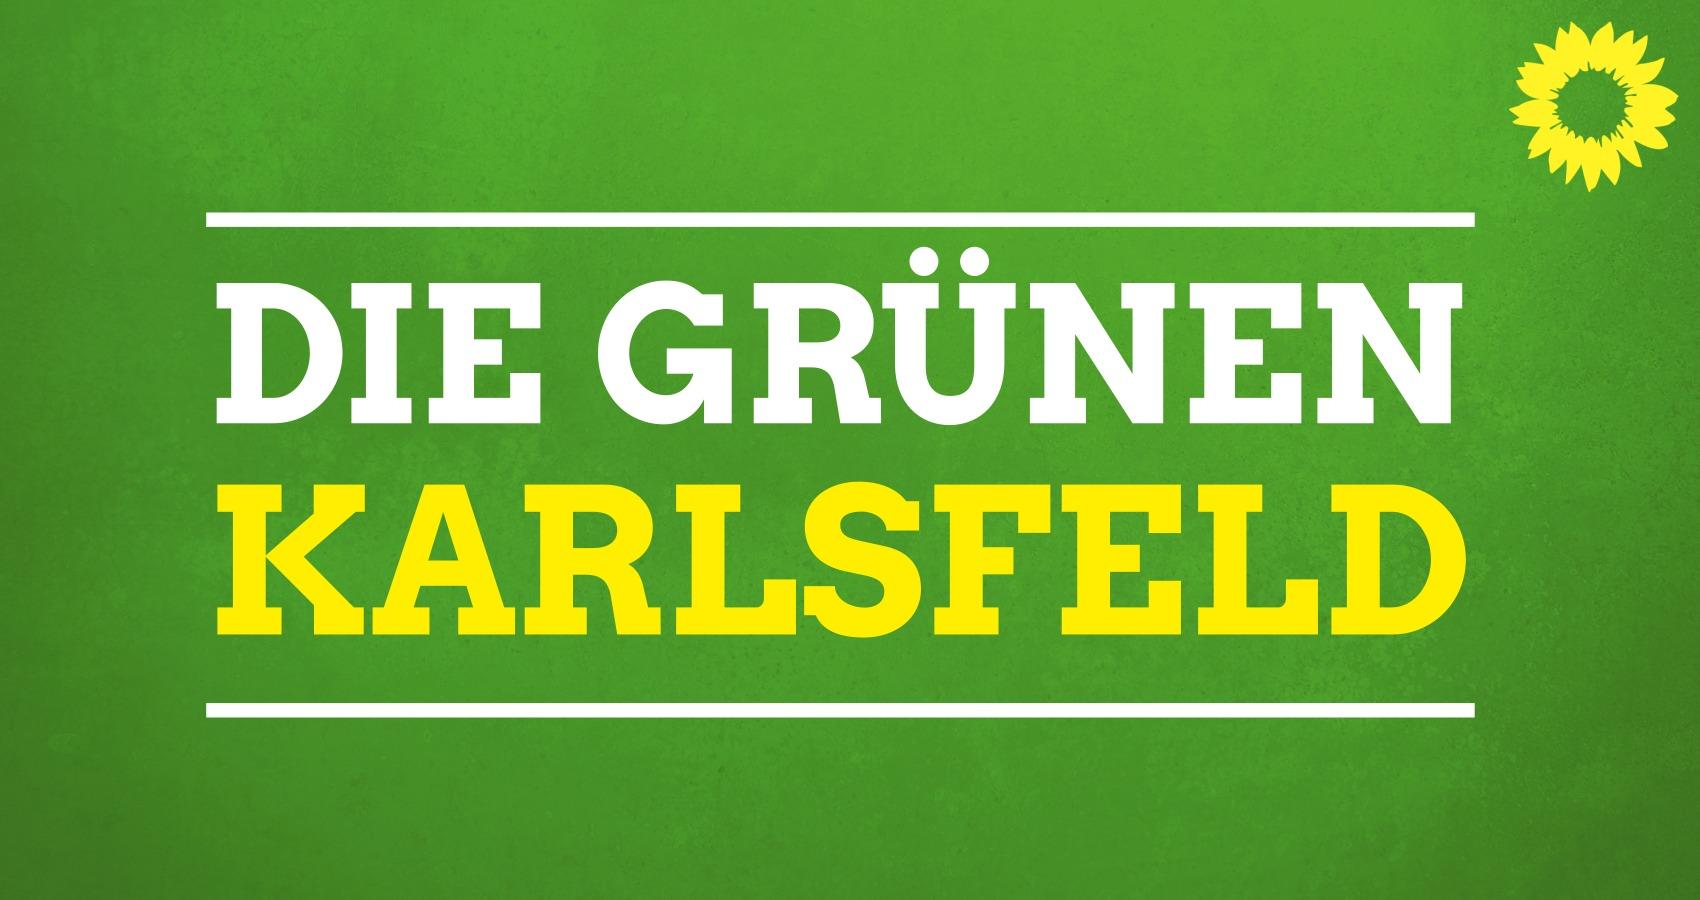 Ortsverband Karlsfeld ist neu gegründet